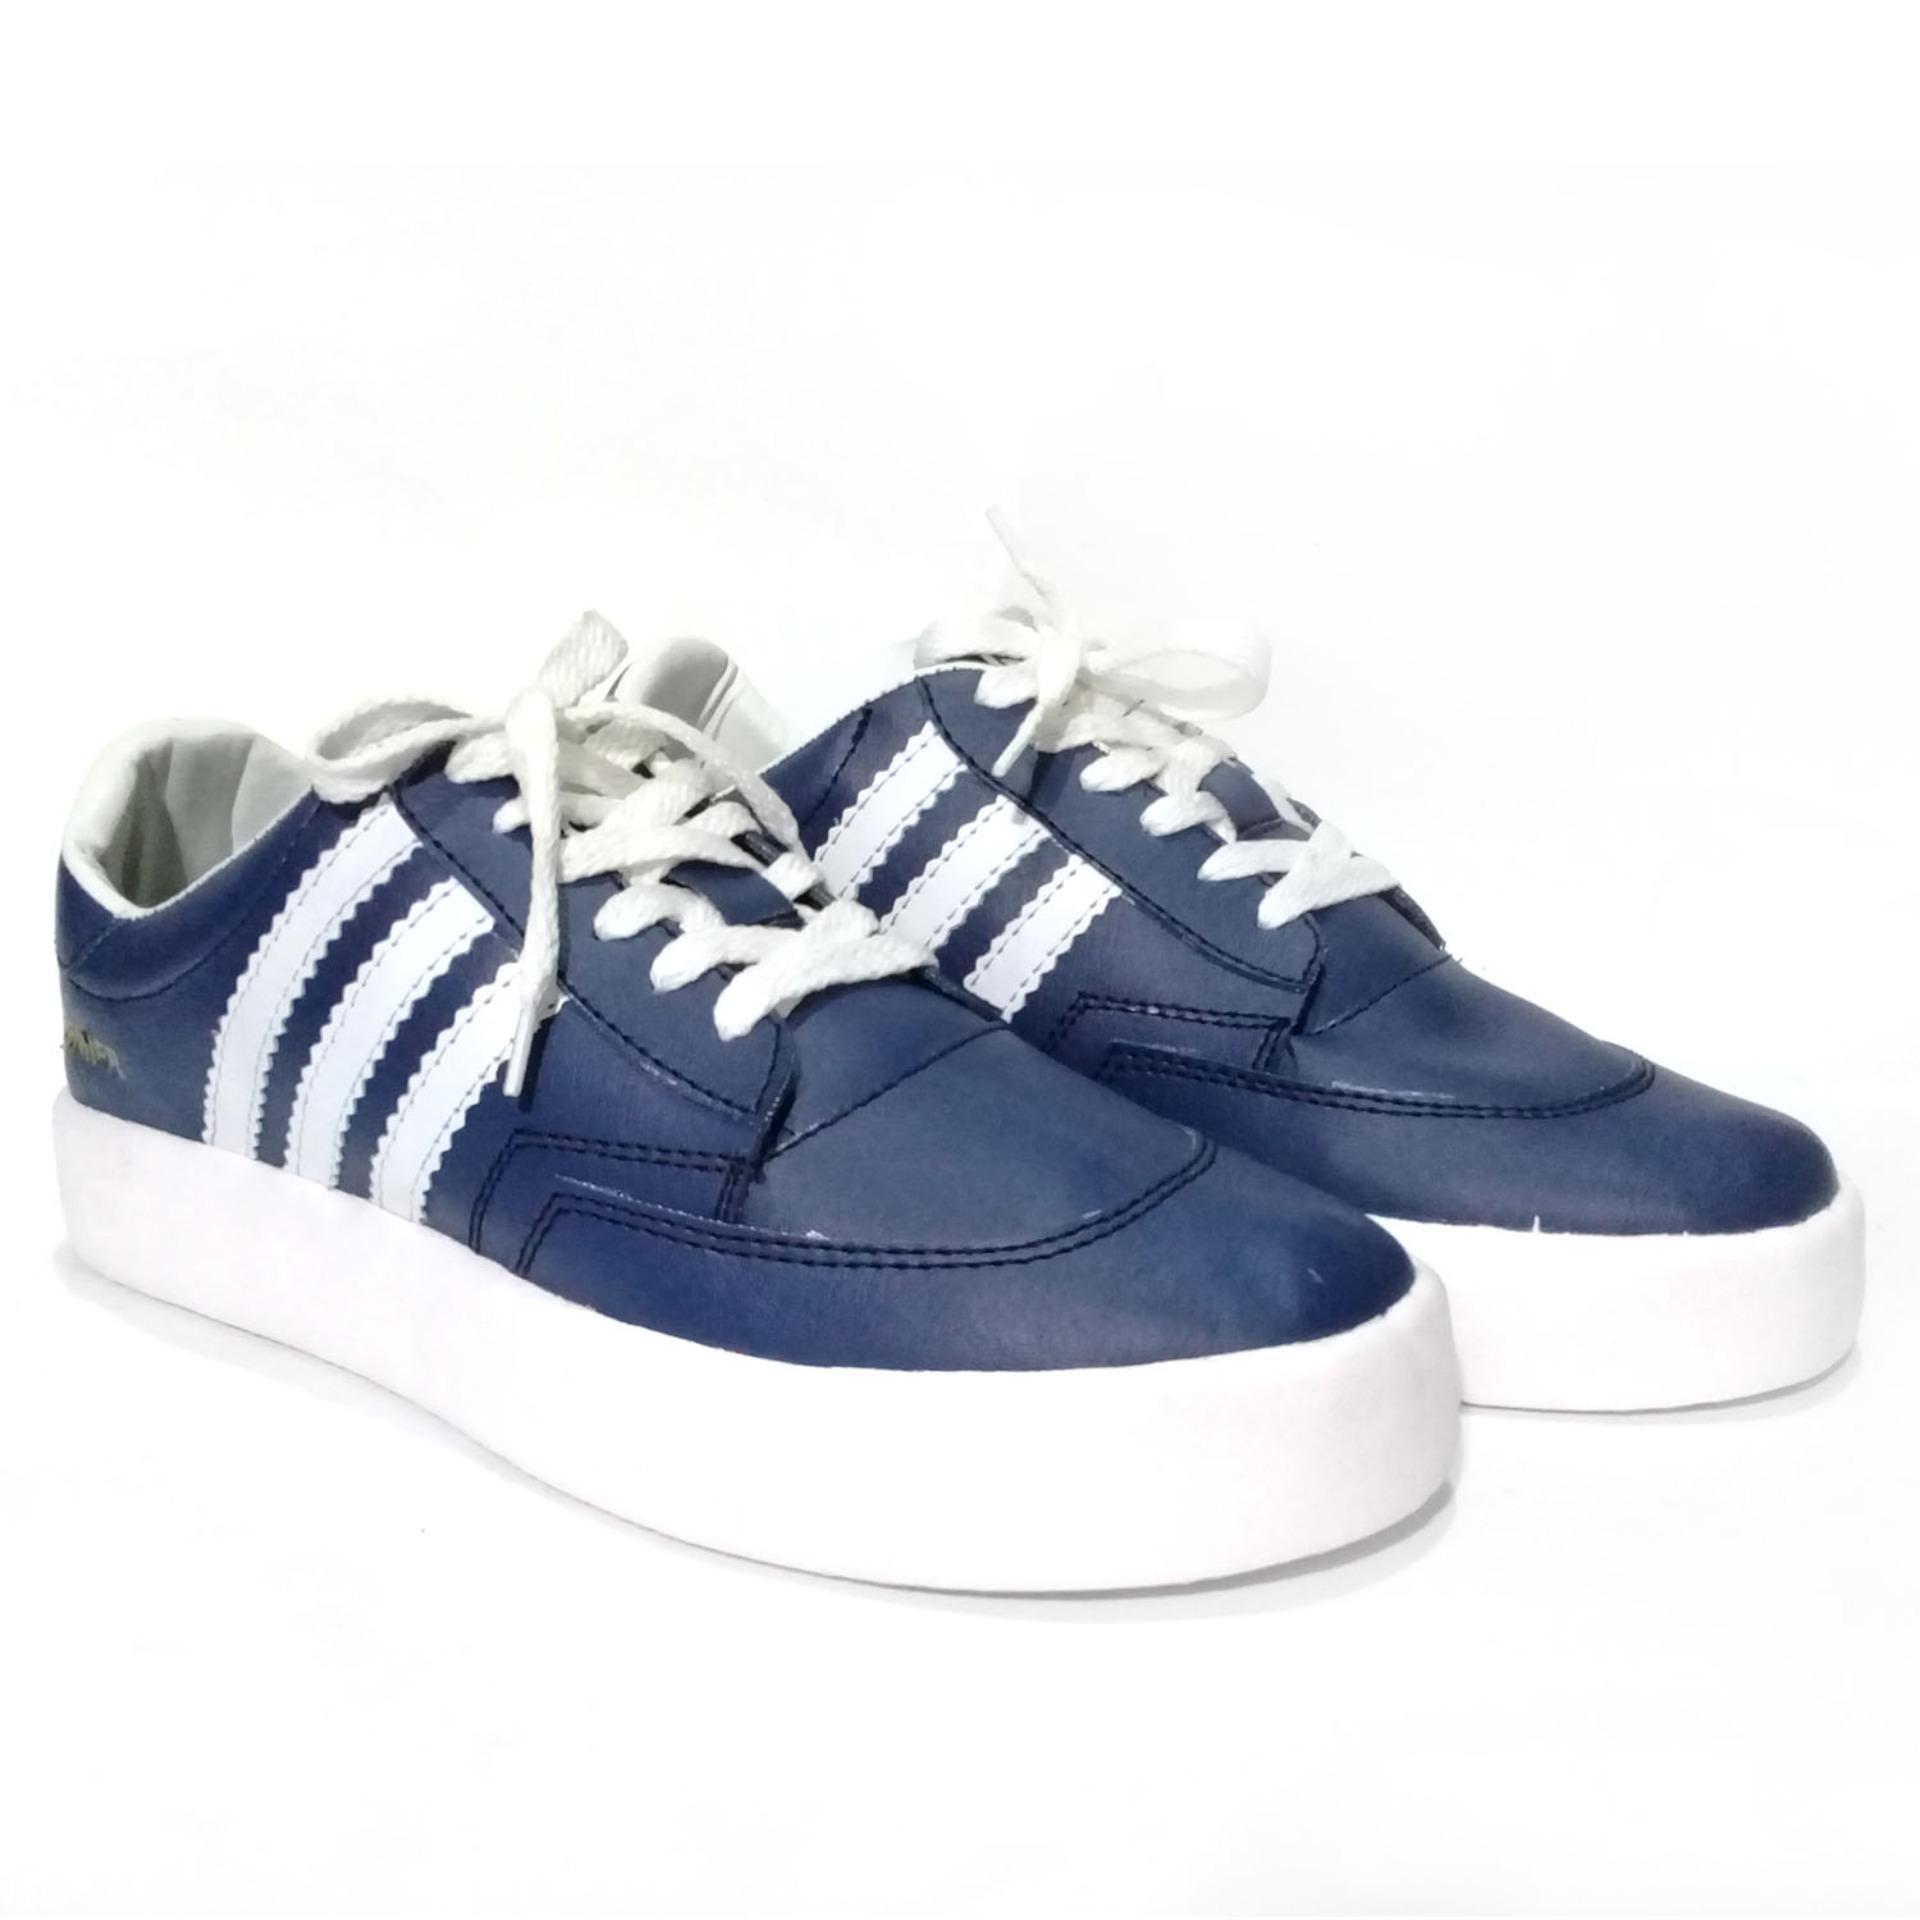 Harga Sepatu Pria Sneakers Premier Warna Biru Dongker Calvien Online